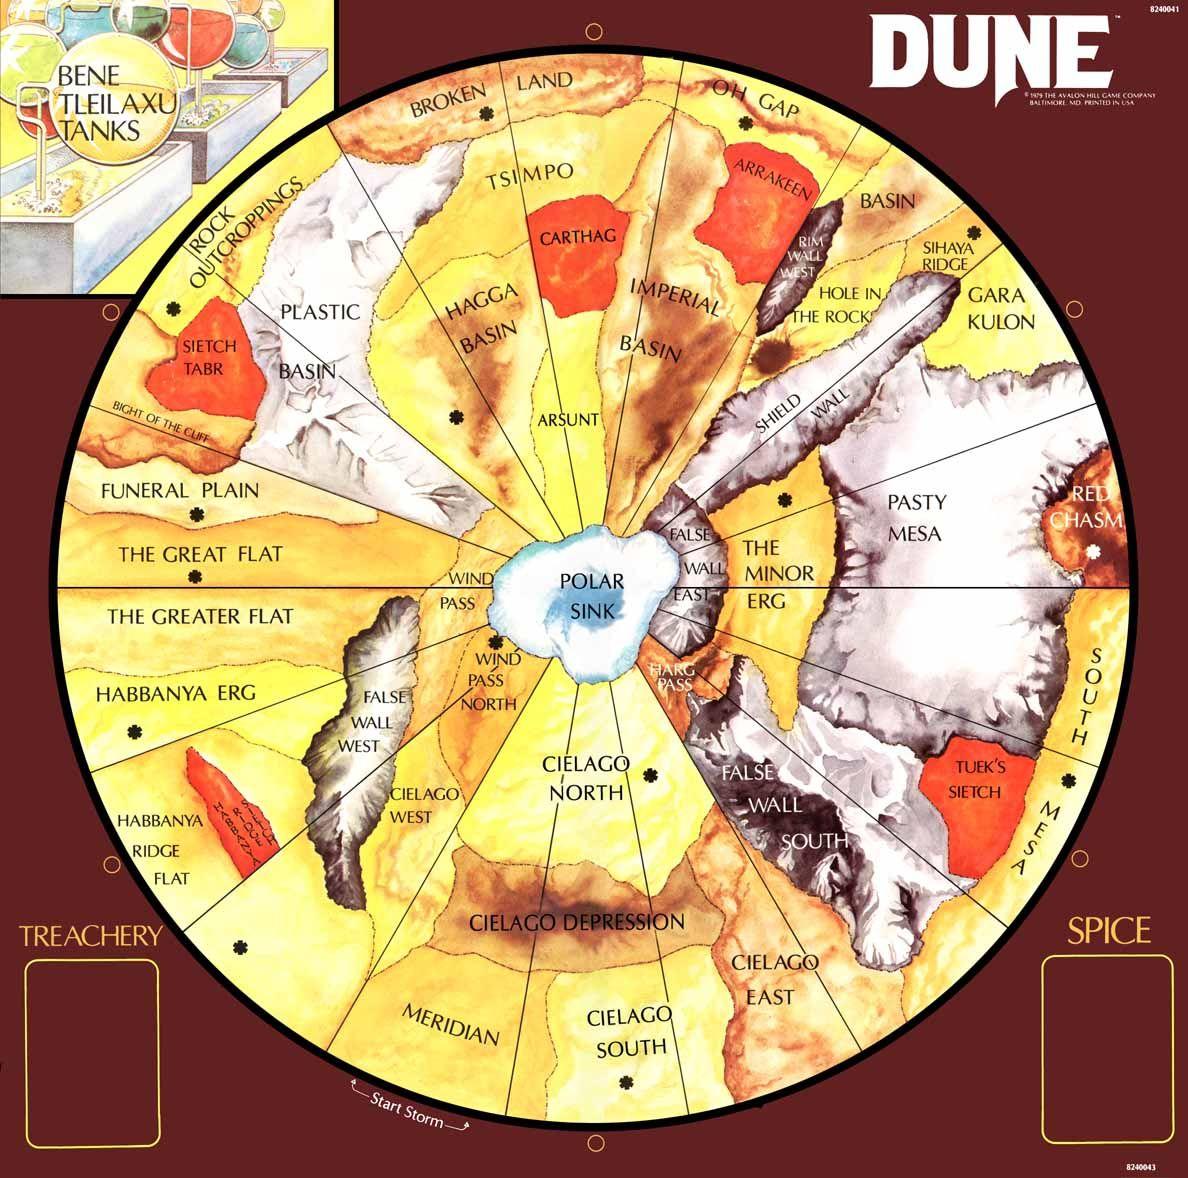 Dune Map on